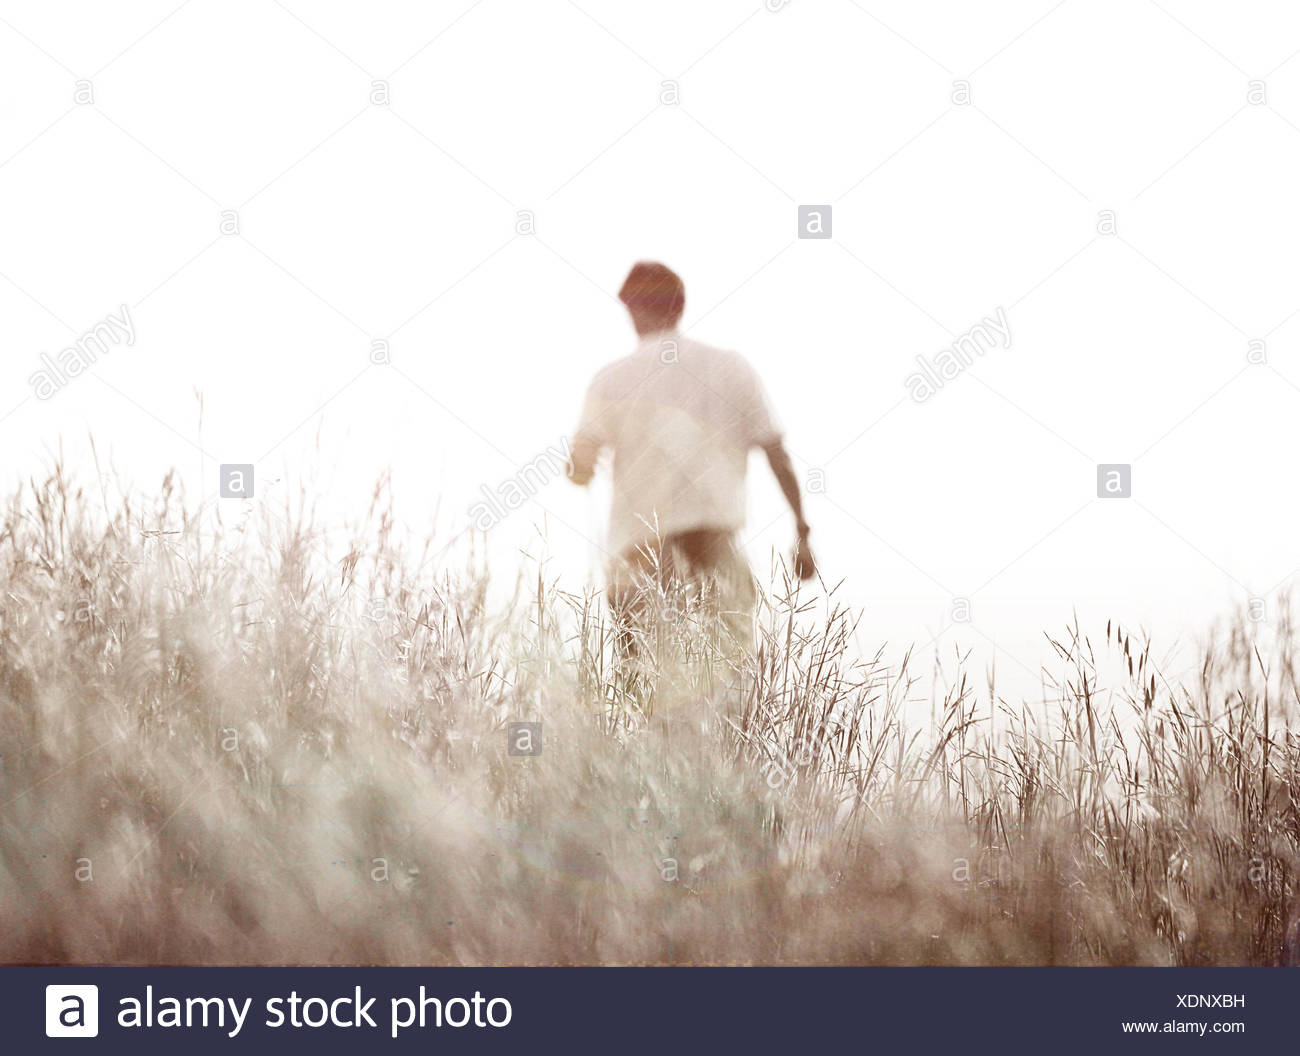 Vista trasera de un hombre en un campo Imagen De Stock